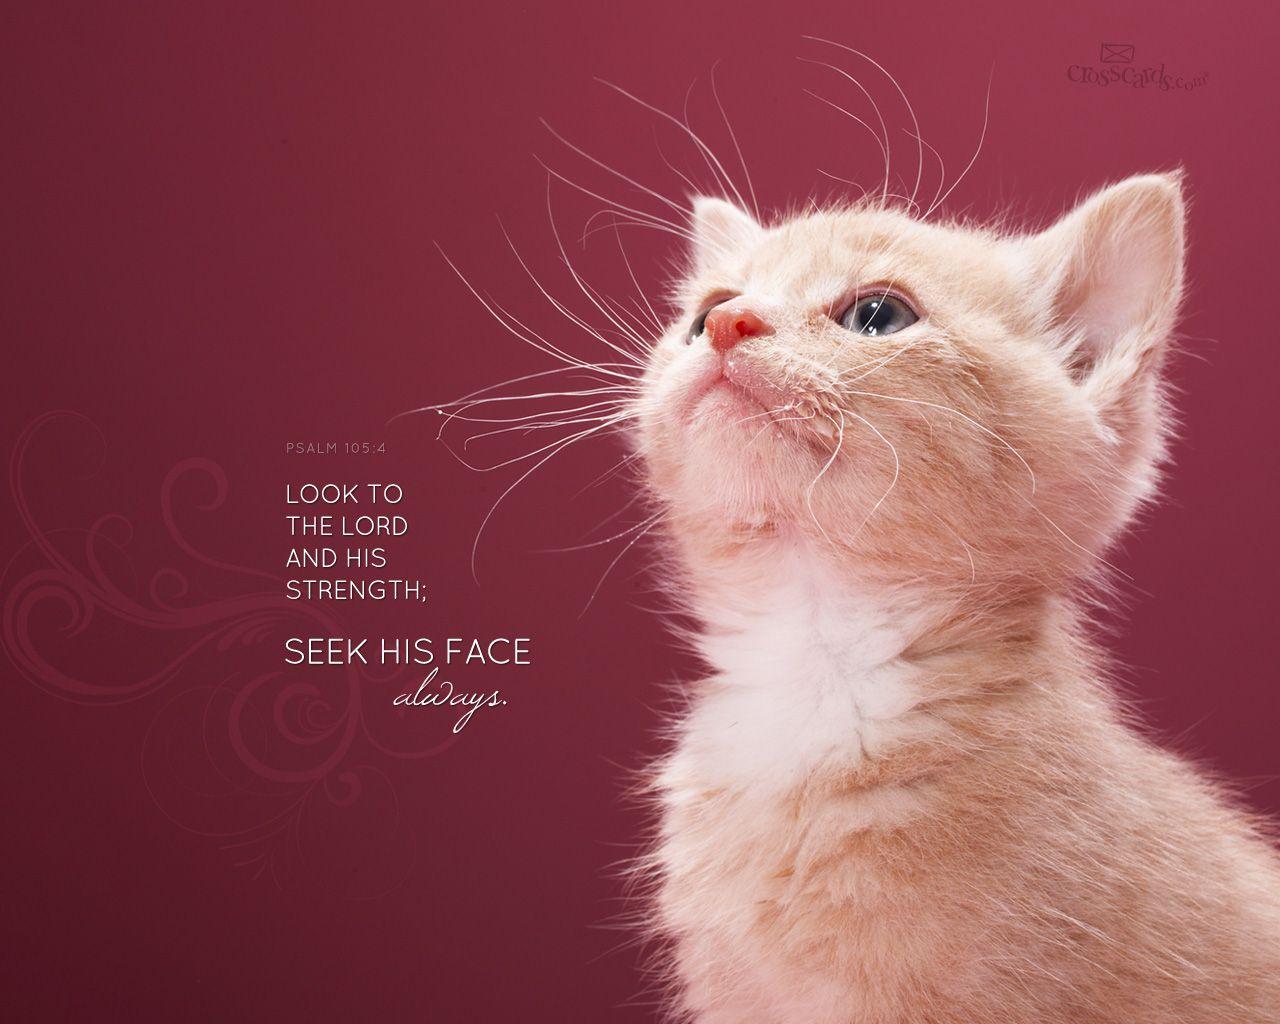 cute bible verse wallpapers | download hd christmas bible verse